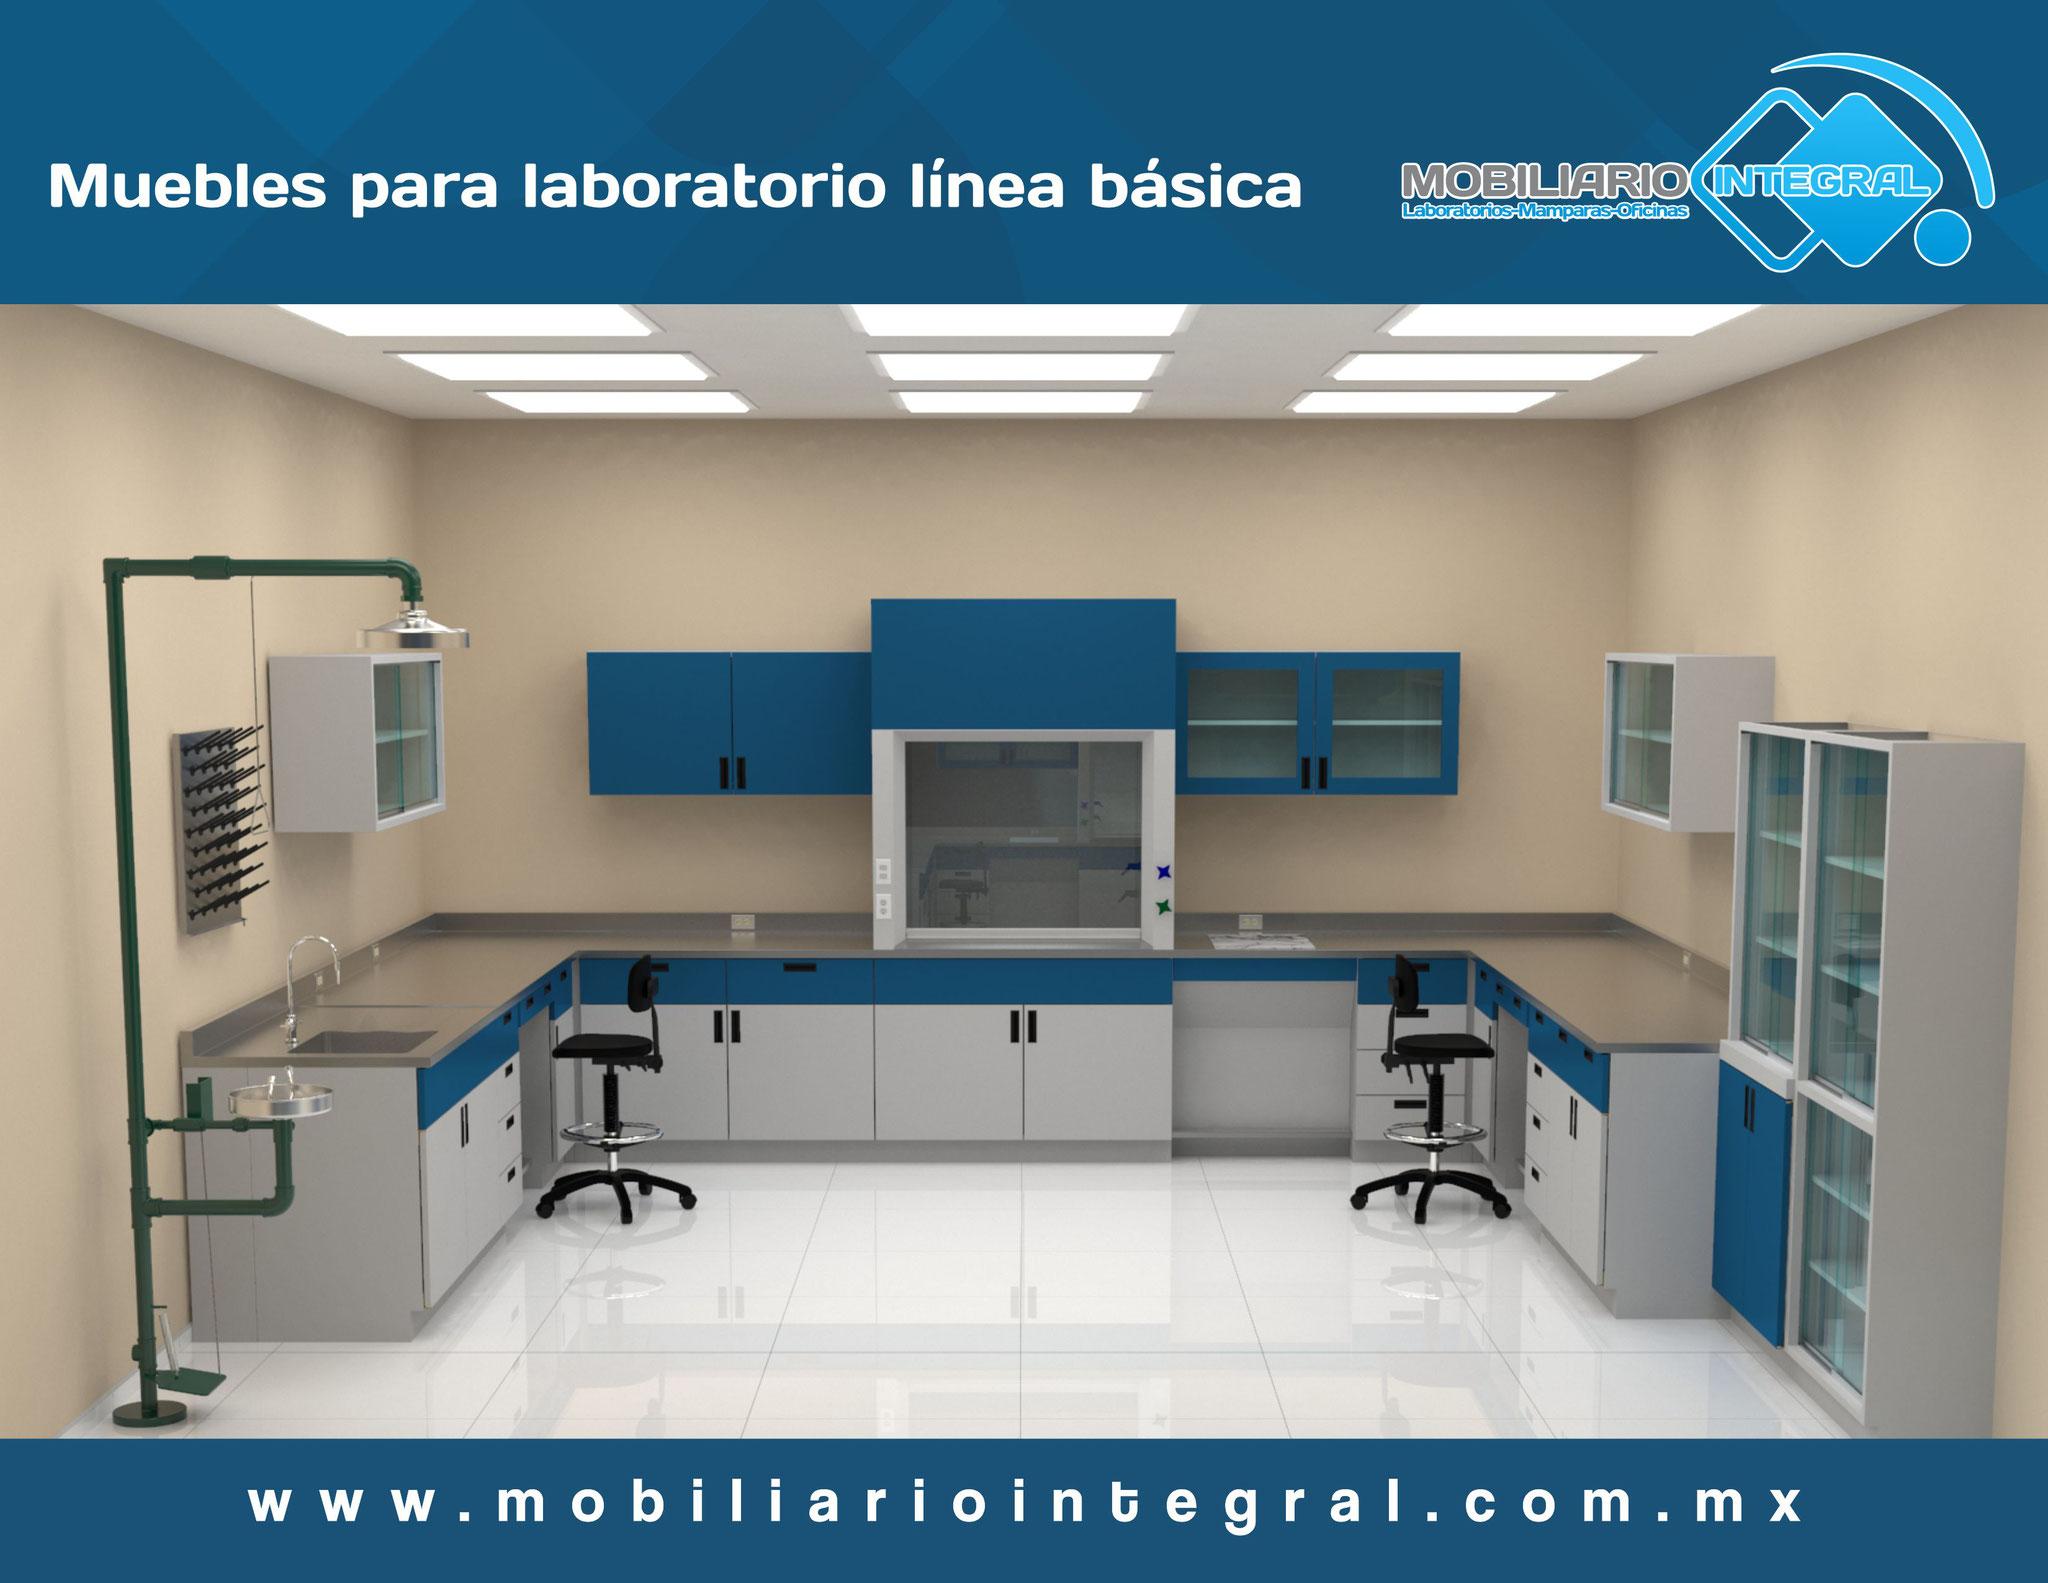 Muebles para laboratorio en Córdoba